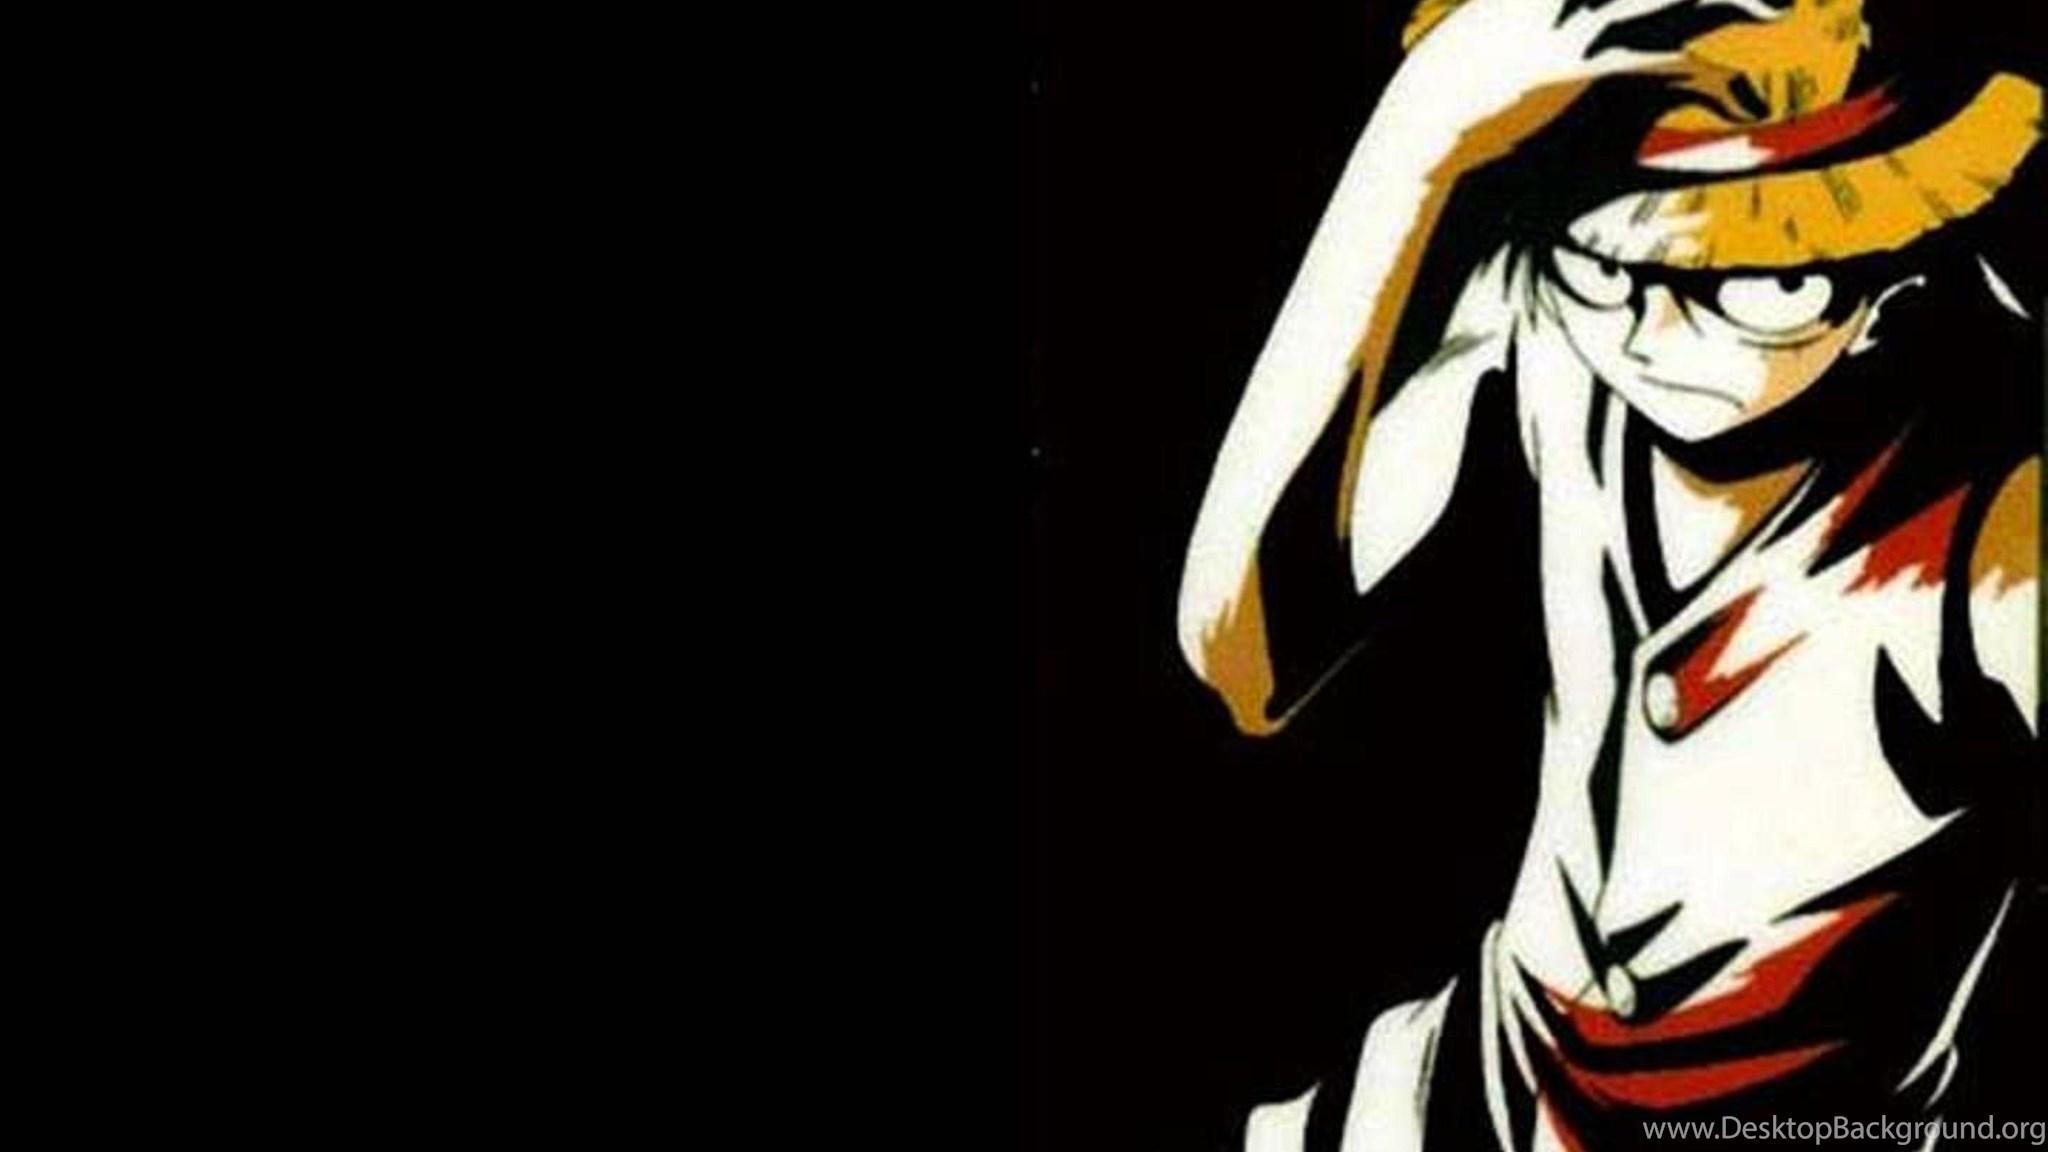 One Piece Ace Hd Wallpaper Images Ndemok Com Desktop Background